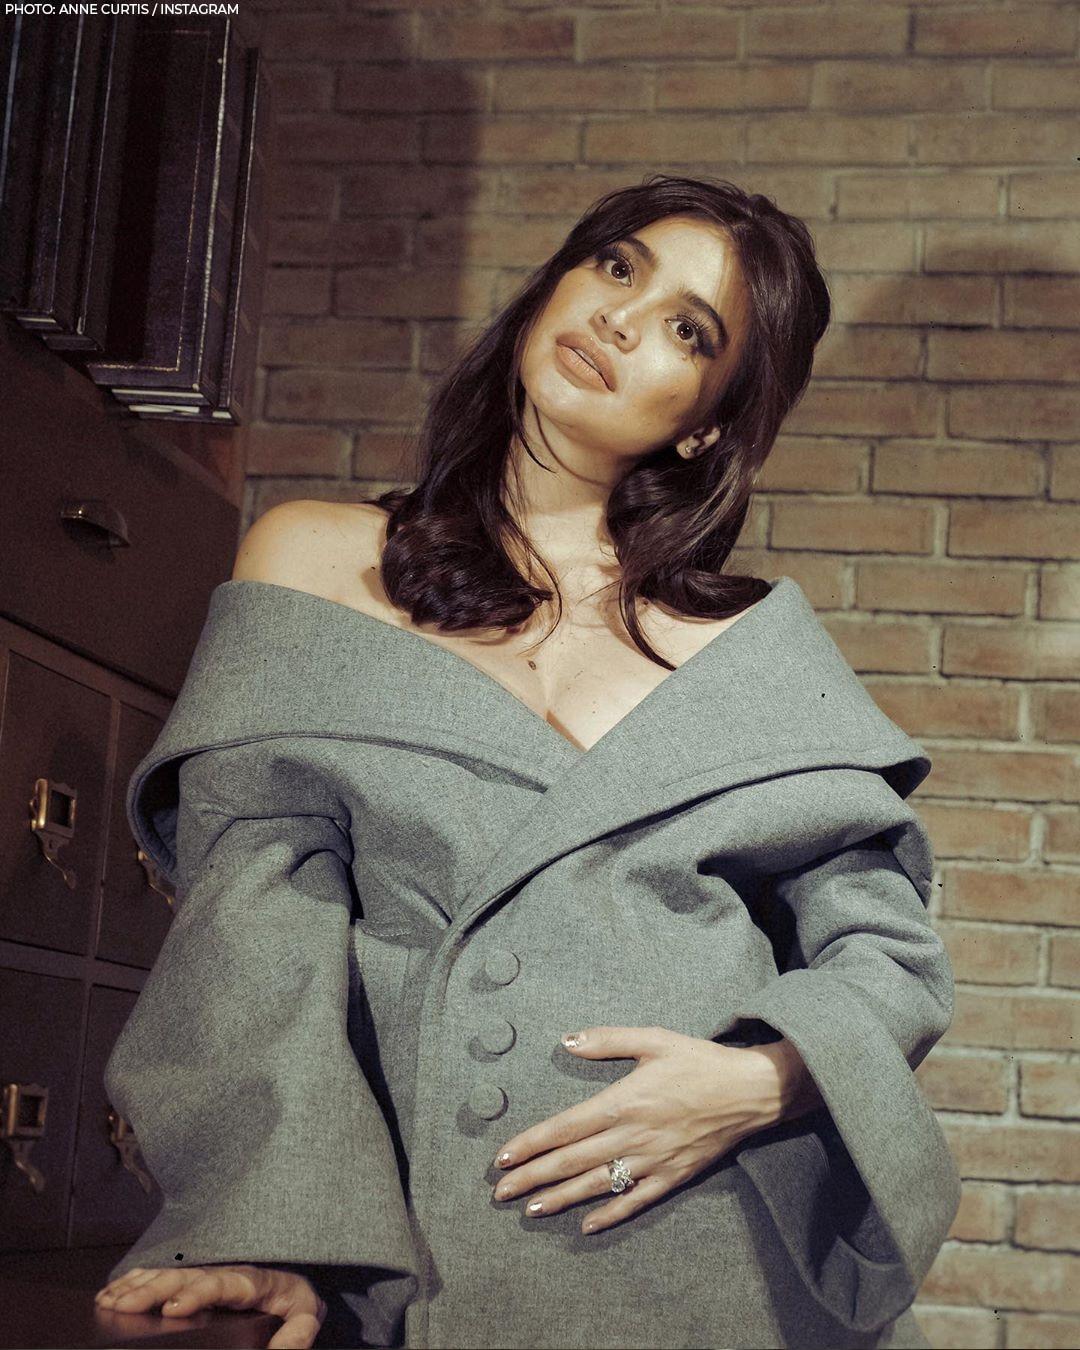 Anne Curtis' beautiful pregnancy photos